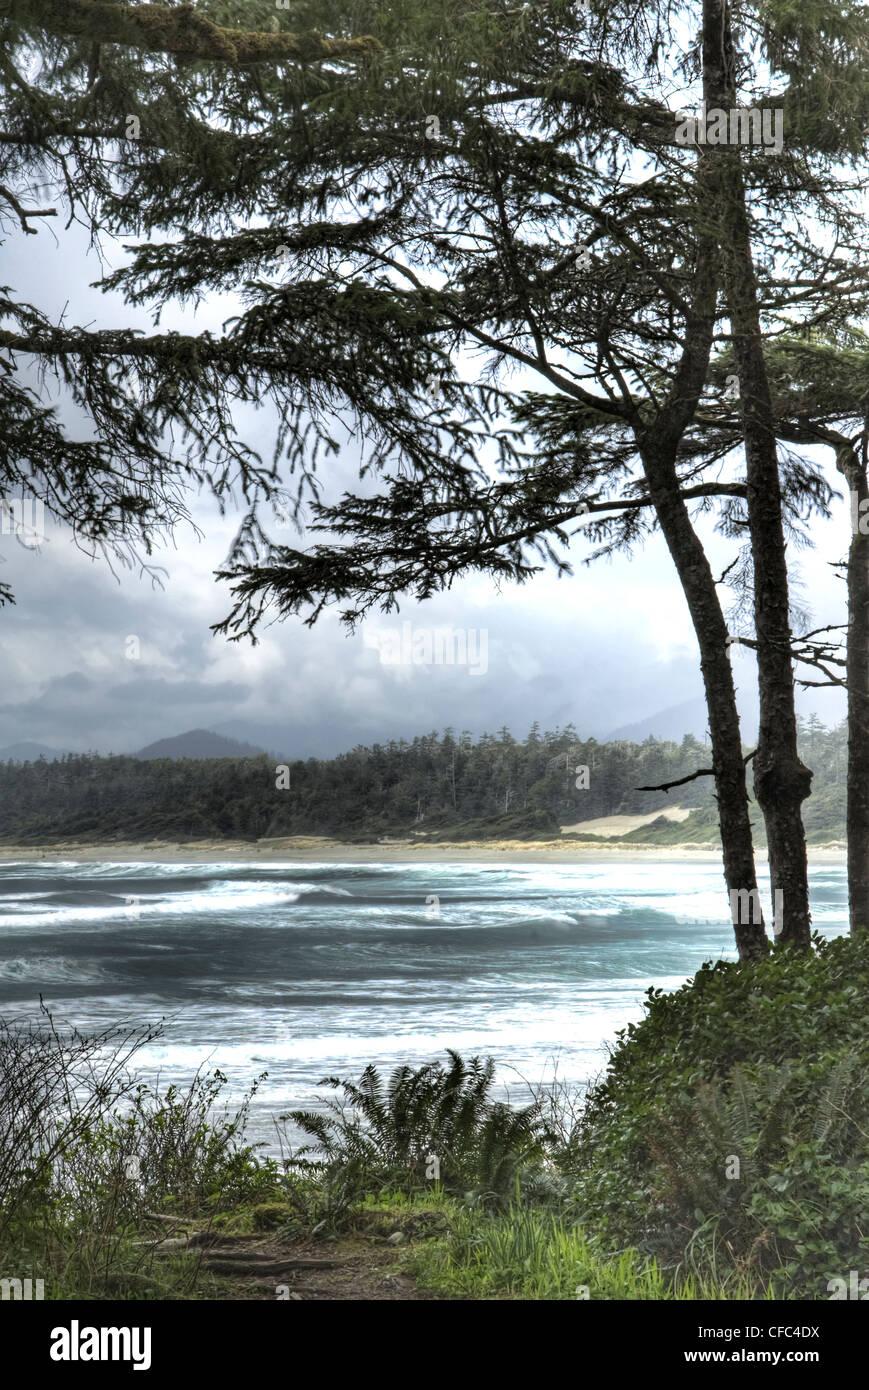 Long Beach, Tofino Wellen umrahmt von Bäumen Stockbild